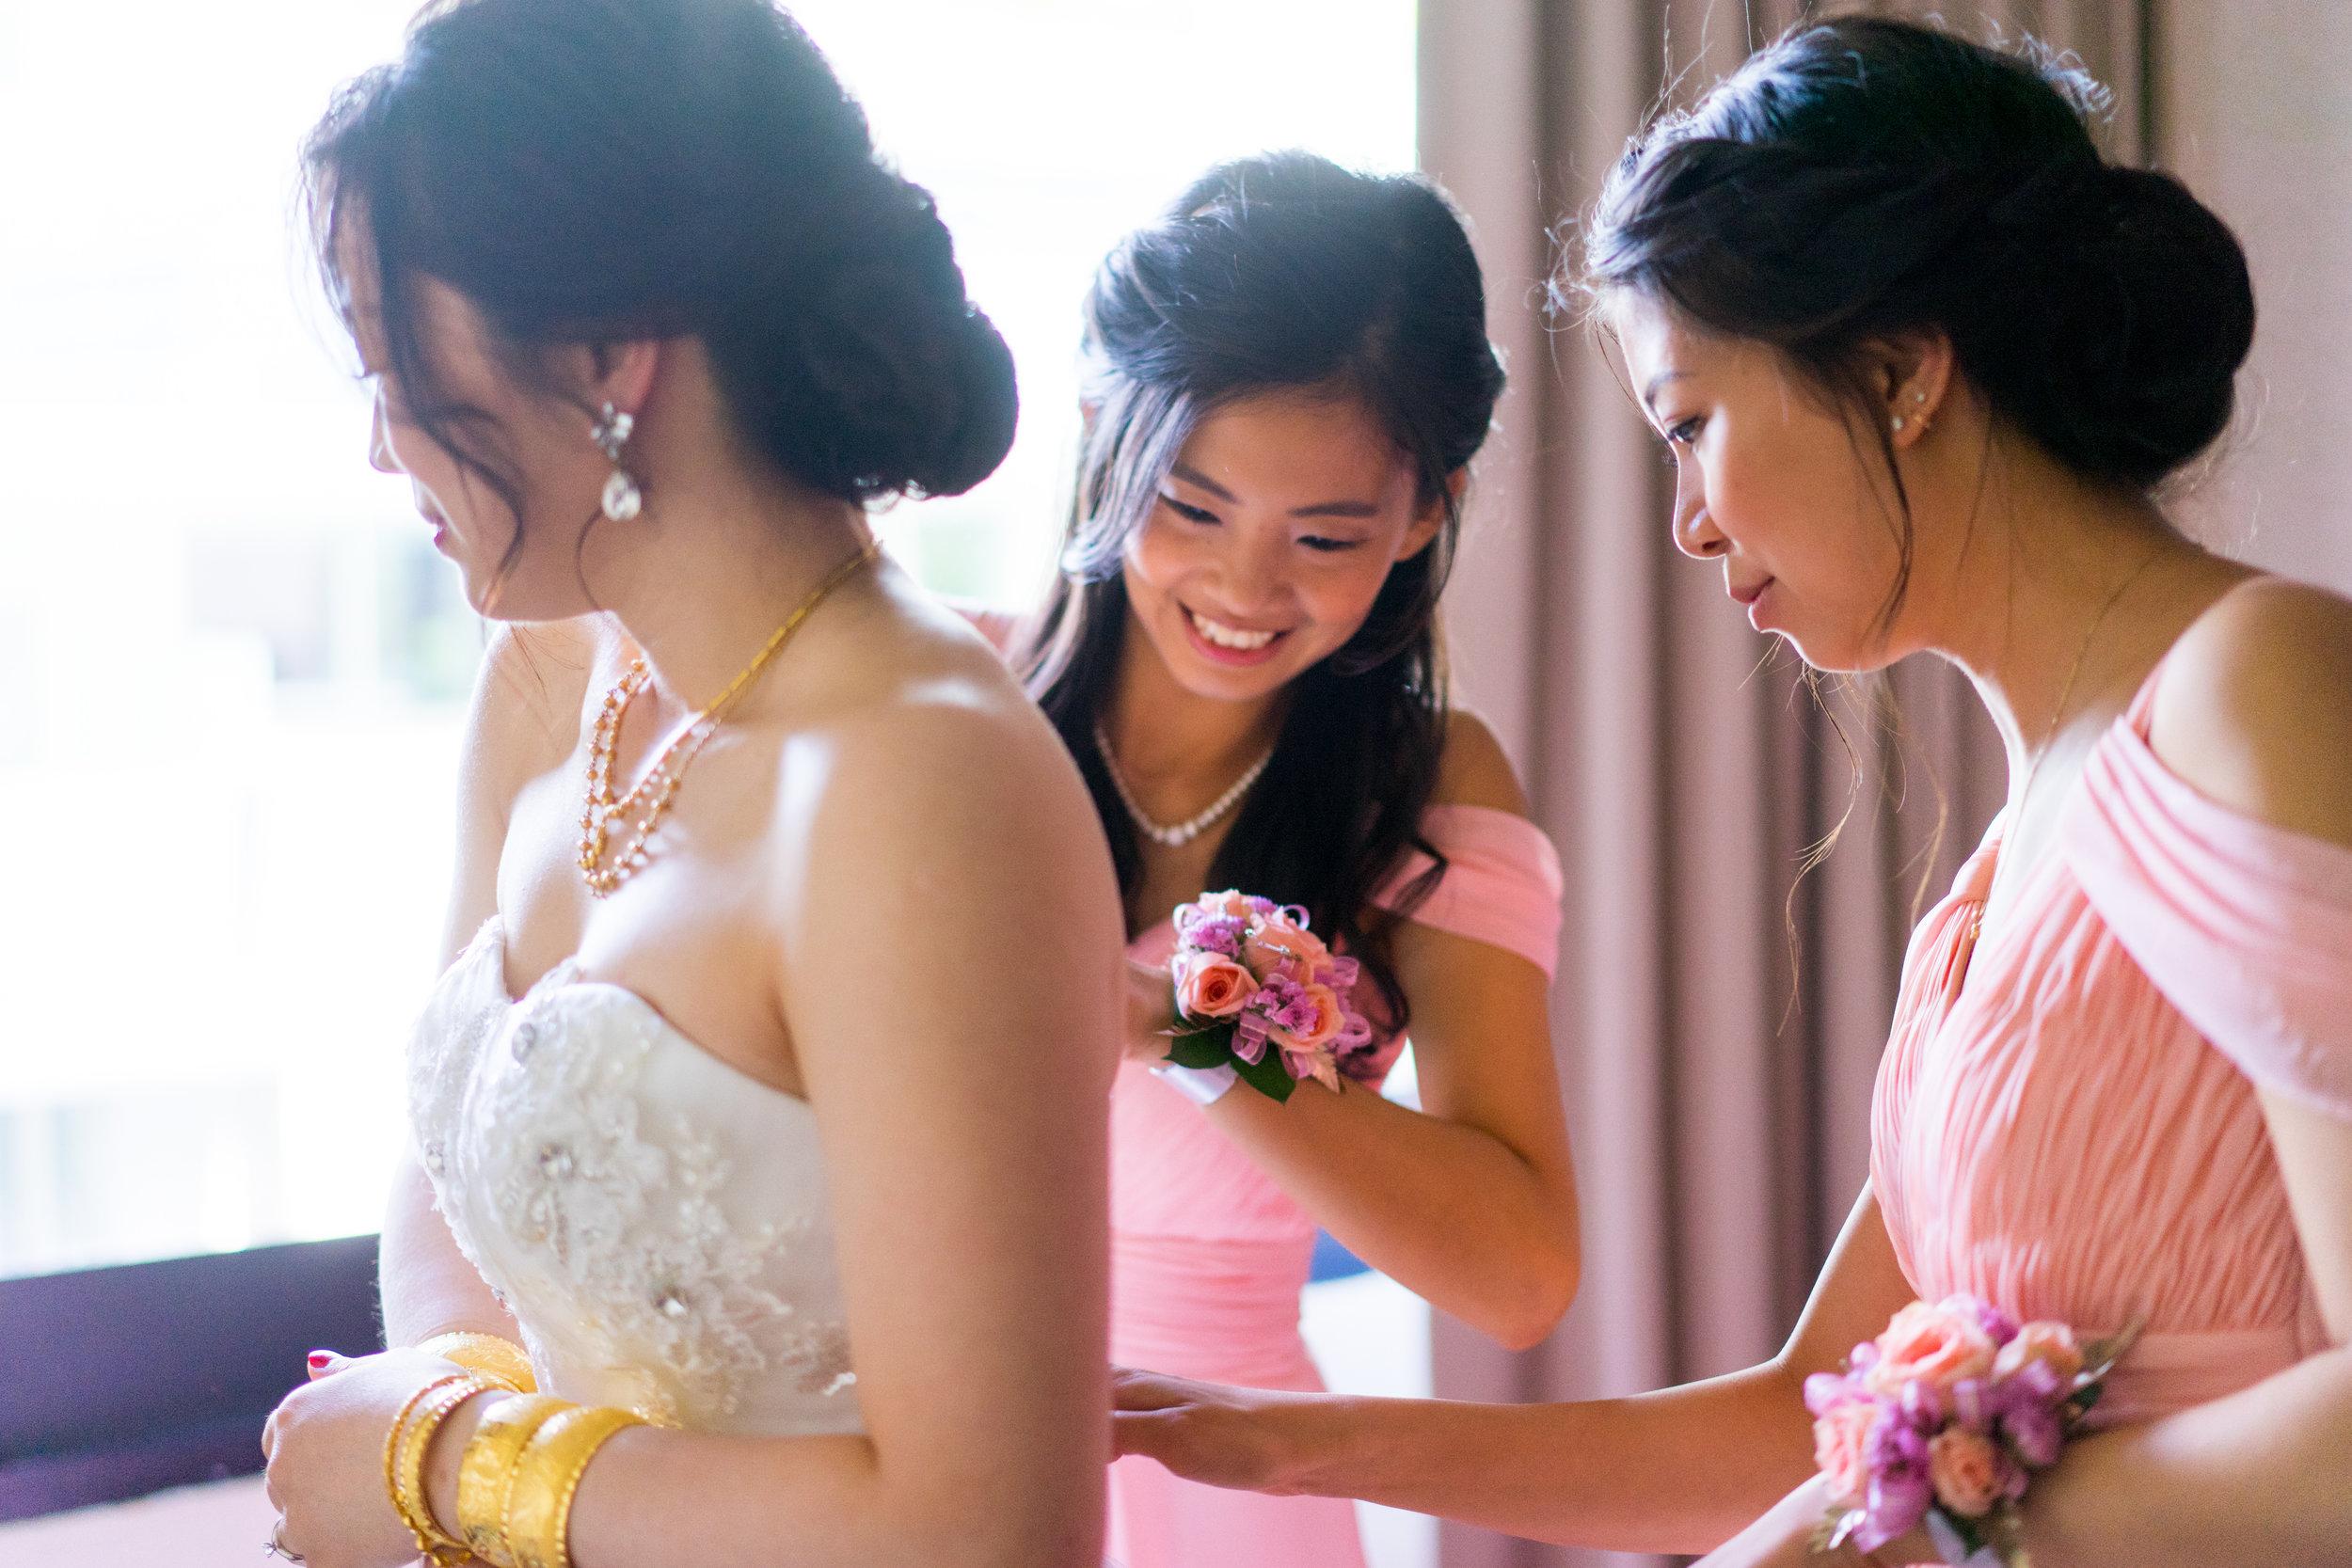 Yessica and Sam s Wedding-01 Getting Ready-0011.jpg